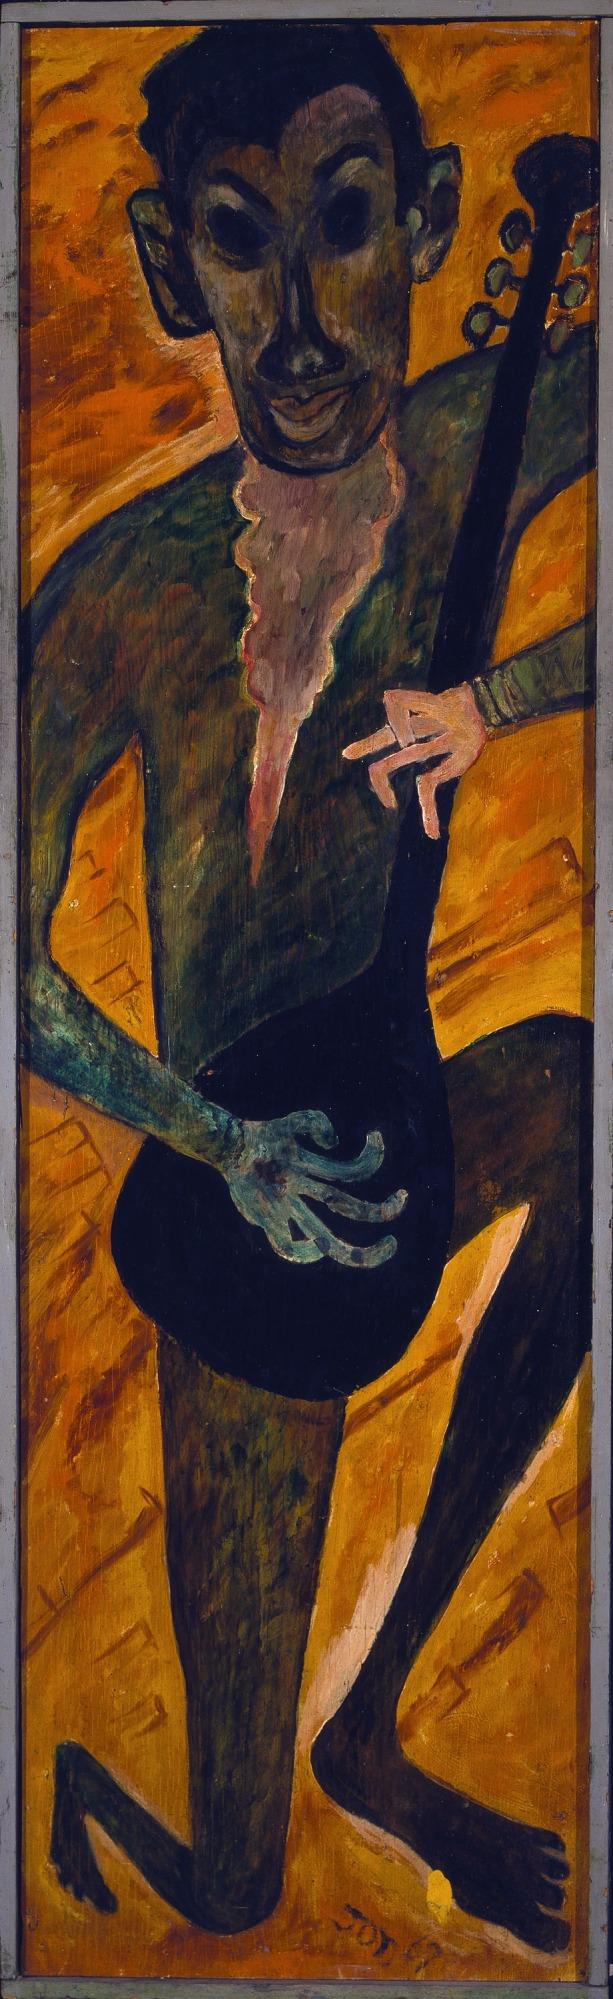 Male Figure - Image version 0